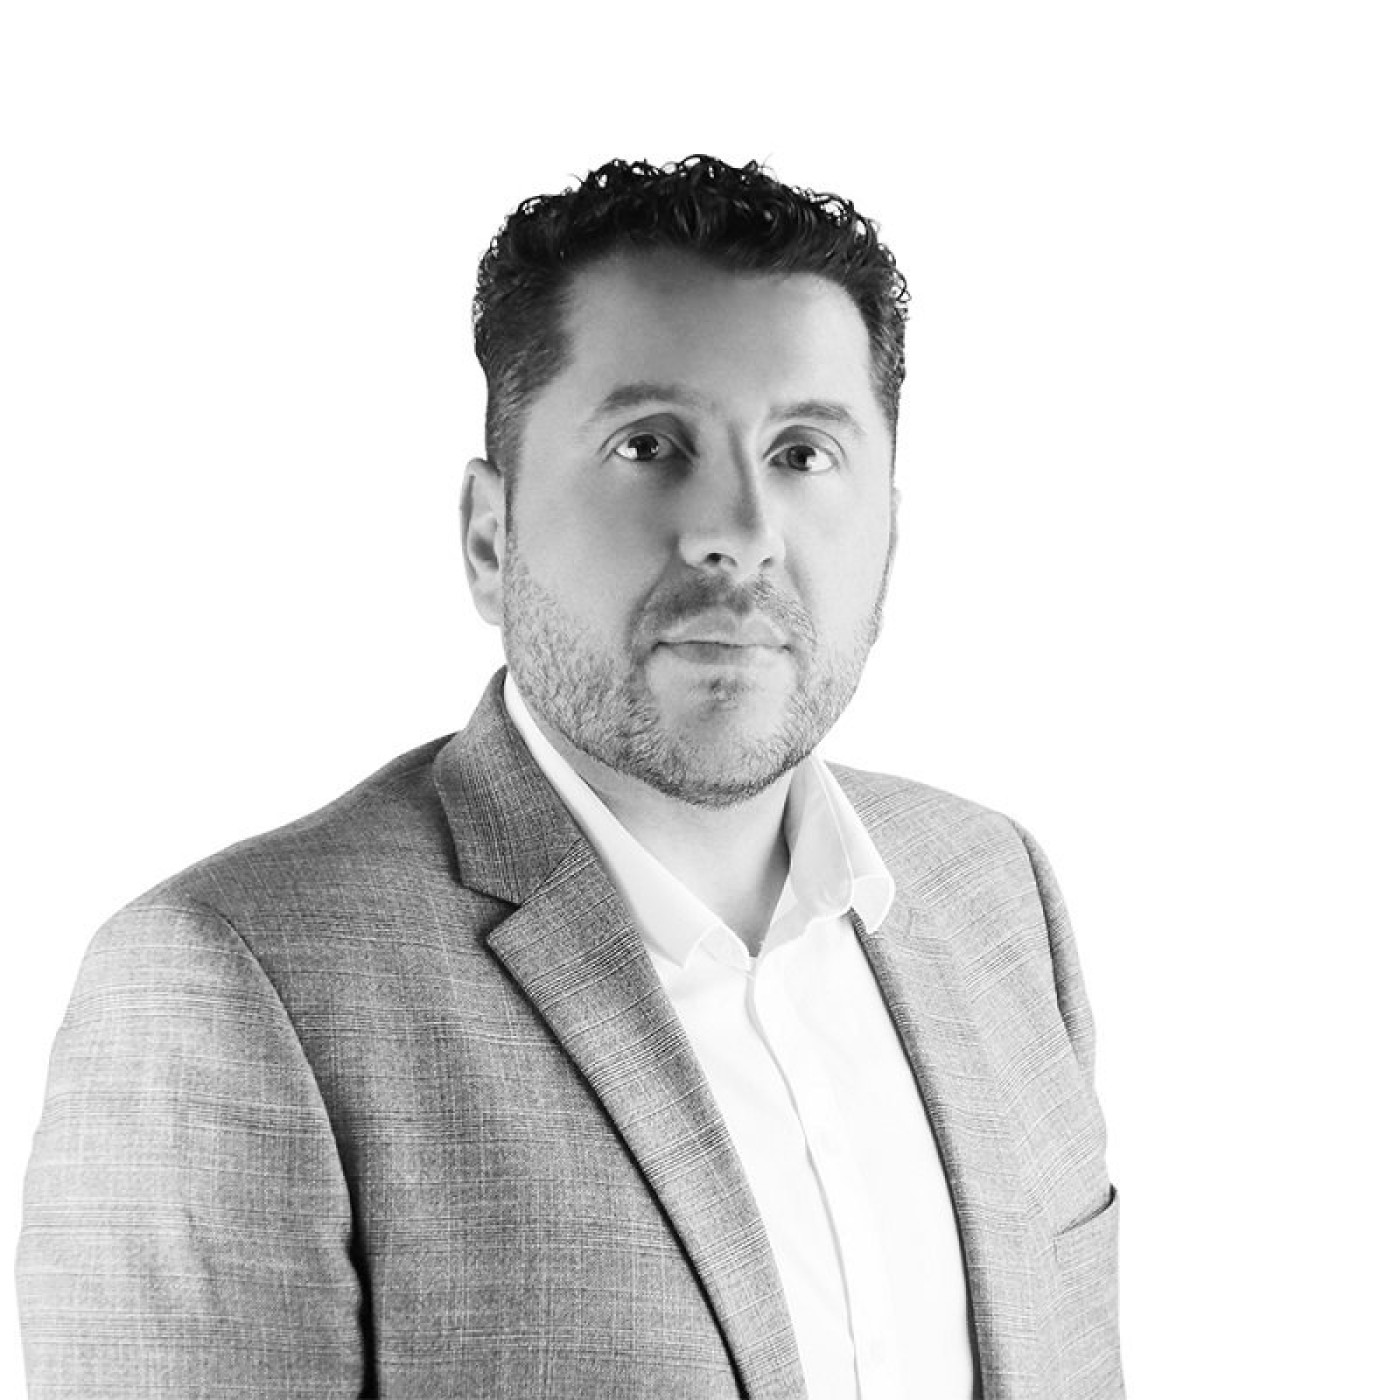 David : directeur de Profil Immo 66 et Immobilier Perpignan 66.